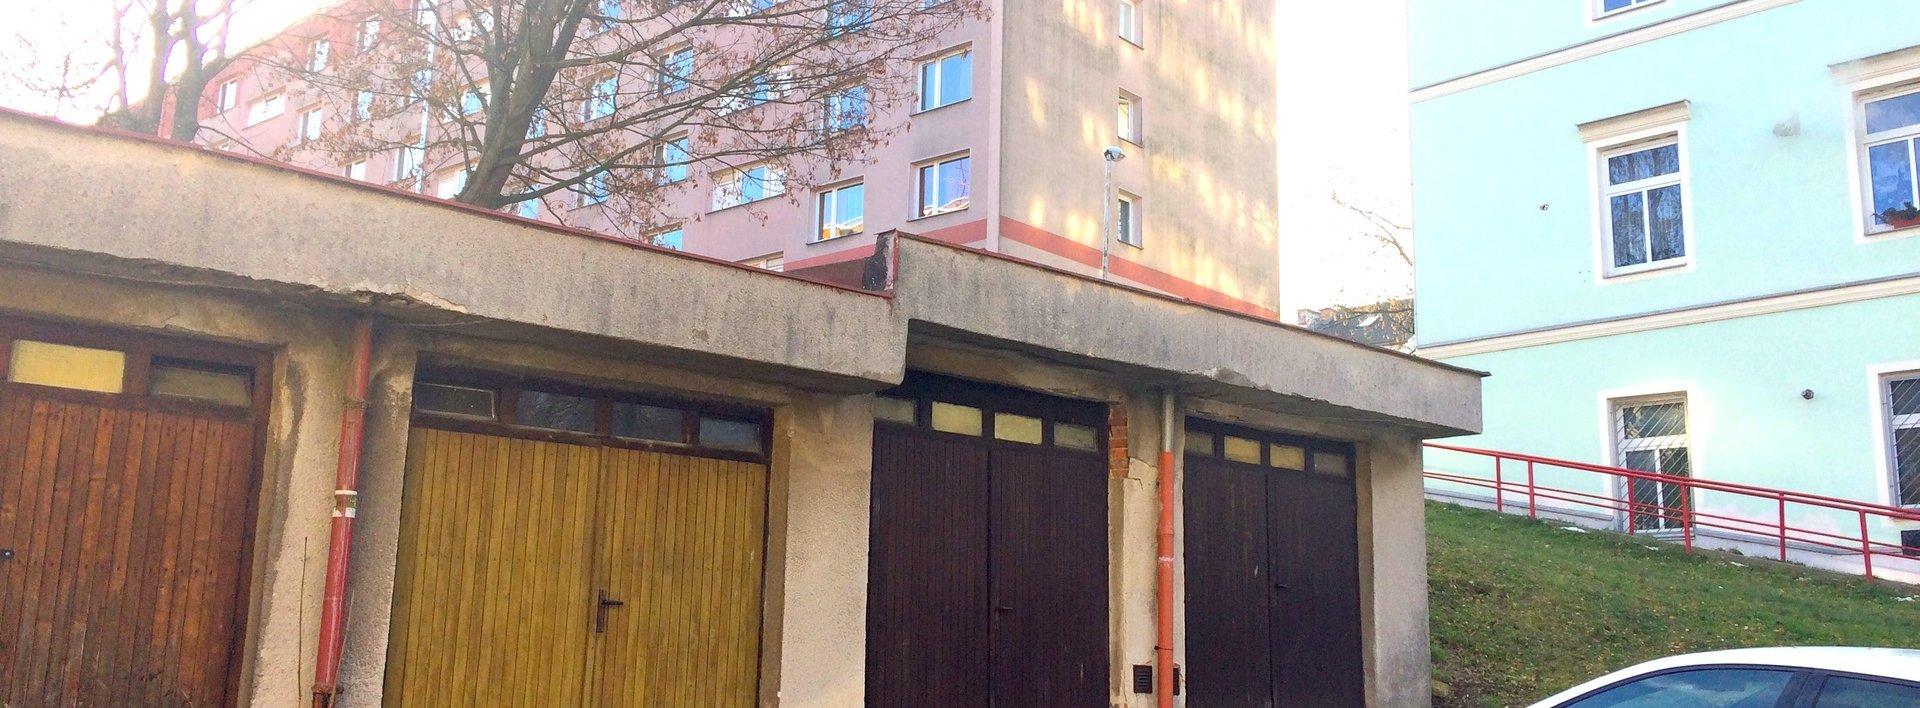 Pronájem garáže, 20m² - Liberec -Jeřáb, ul. Františkovská, Ev.č.: N47928